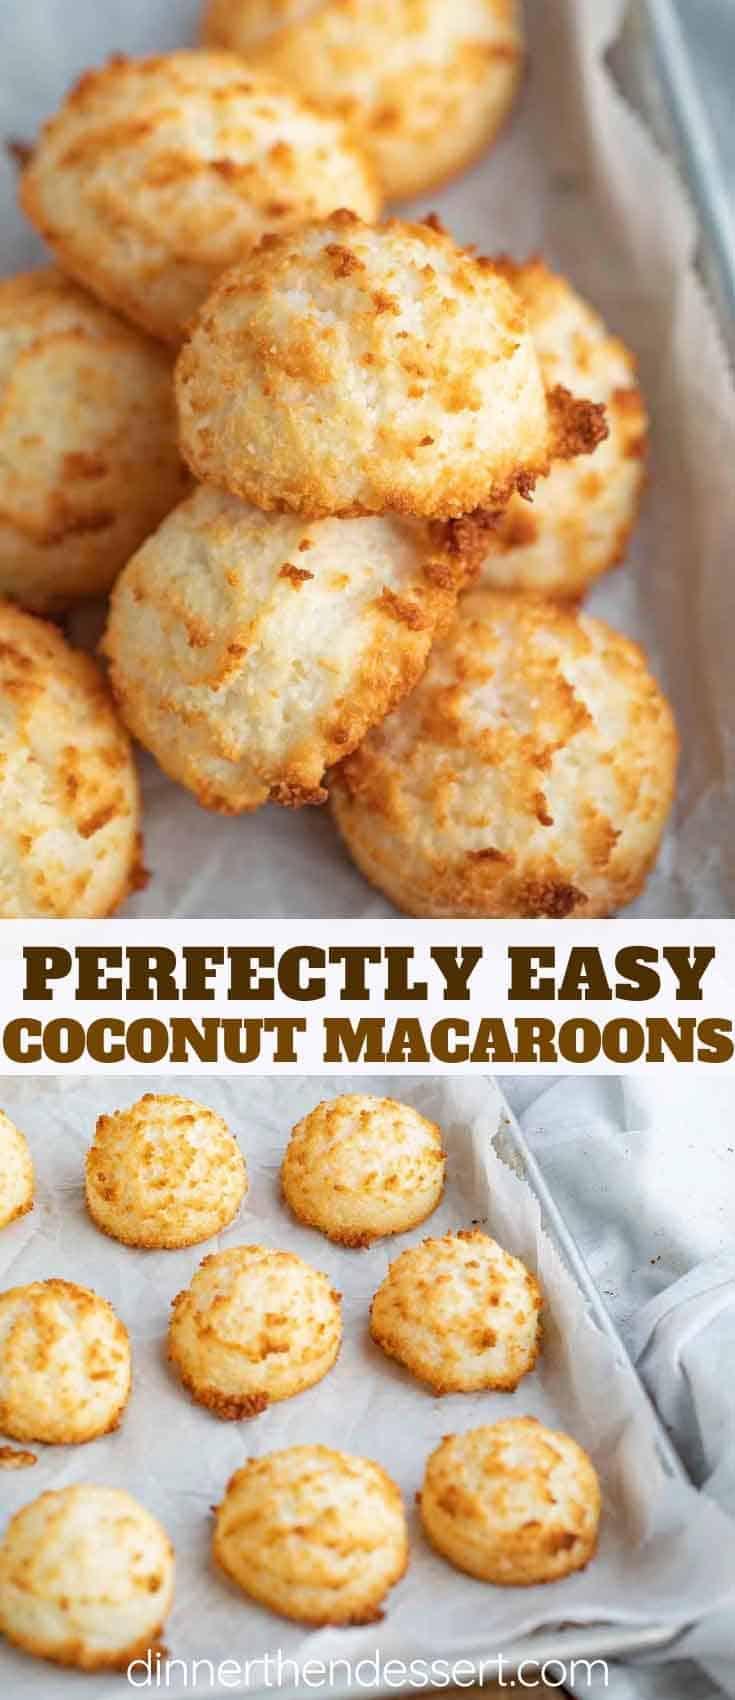 Coconut Macaroons Dinner Then Dessert